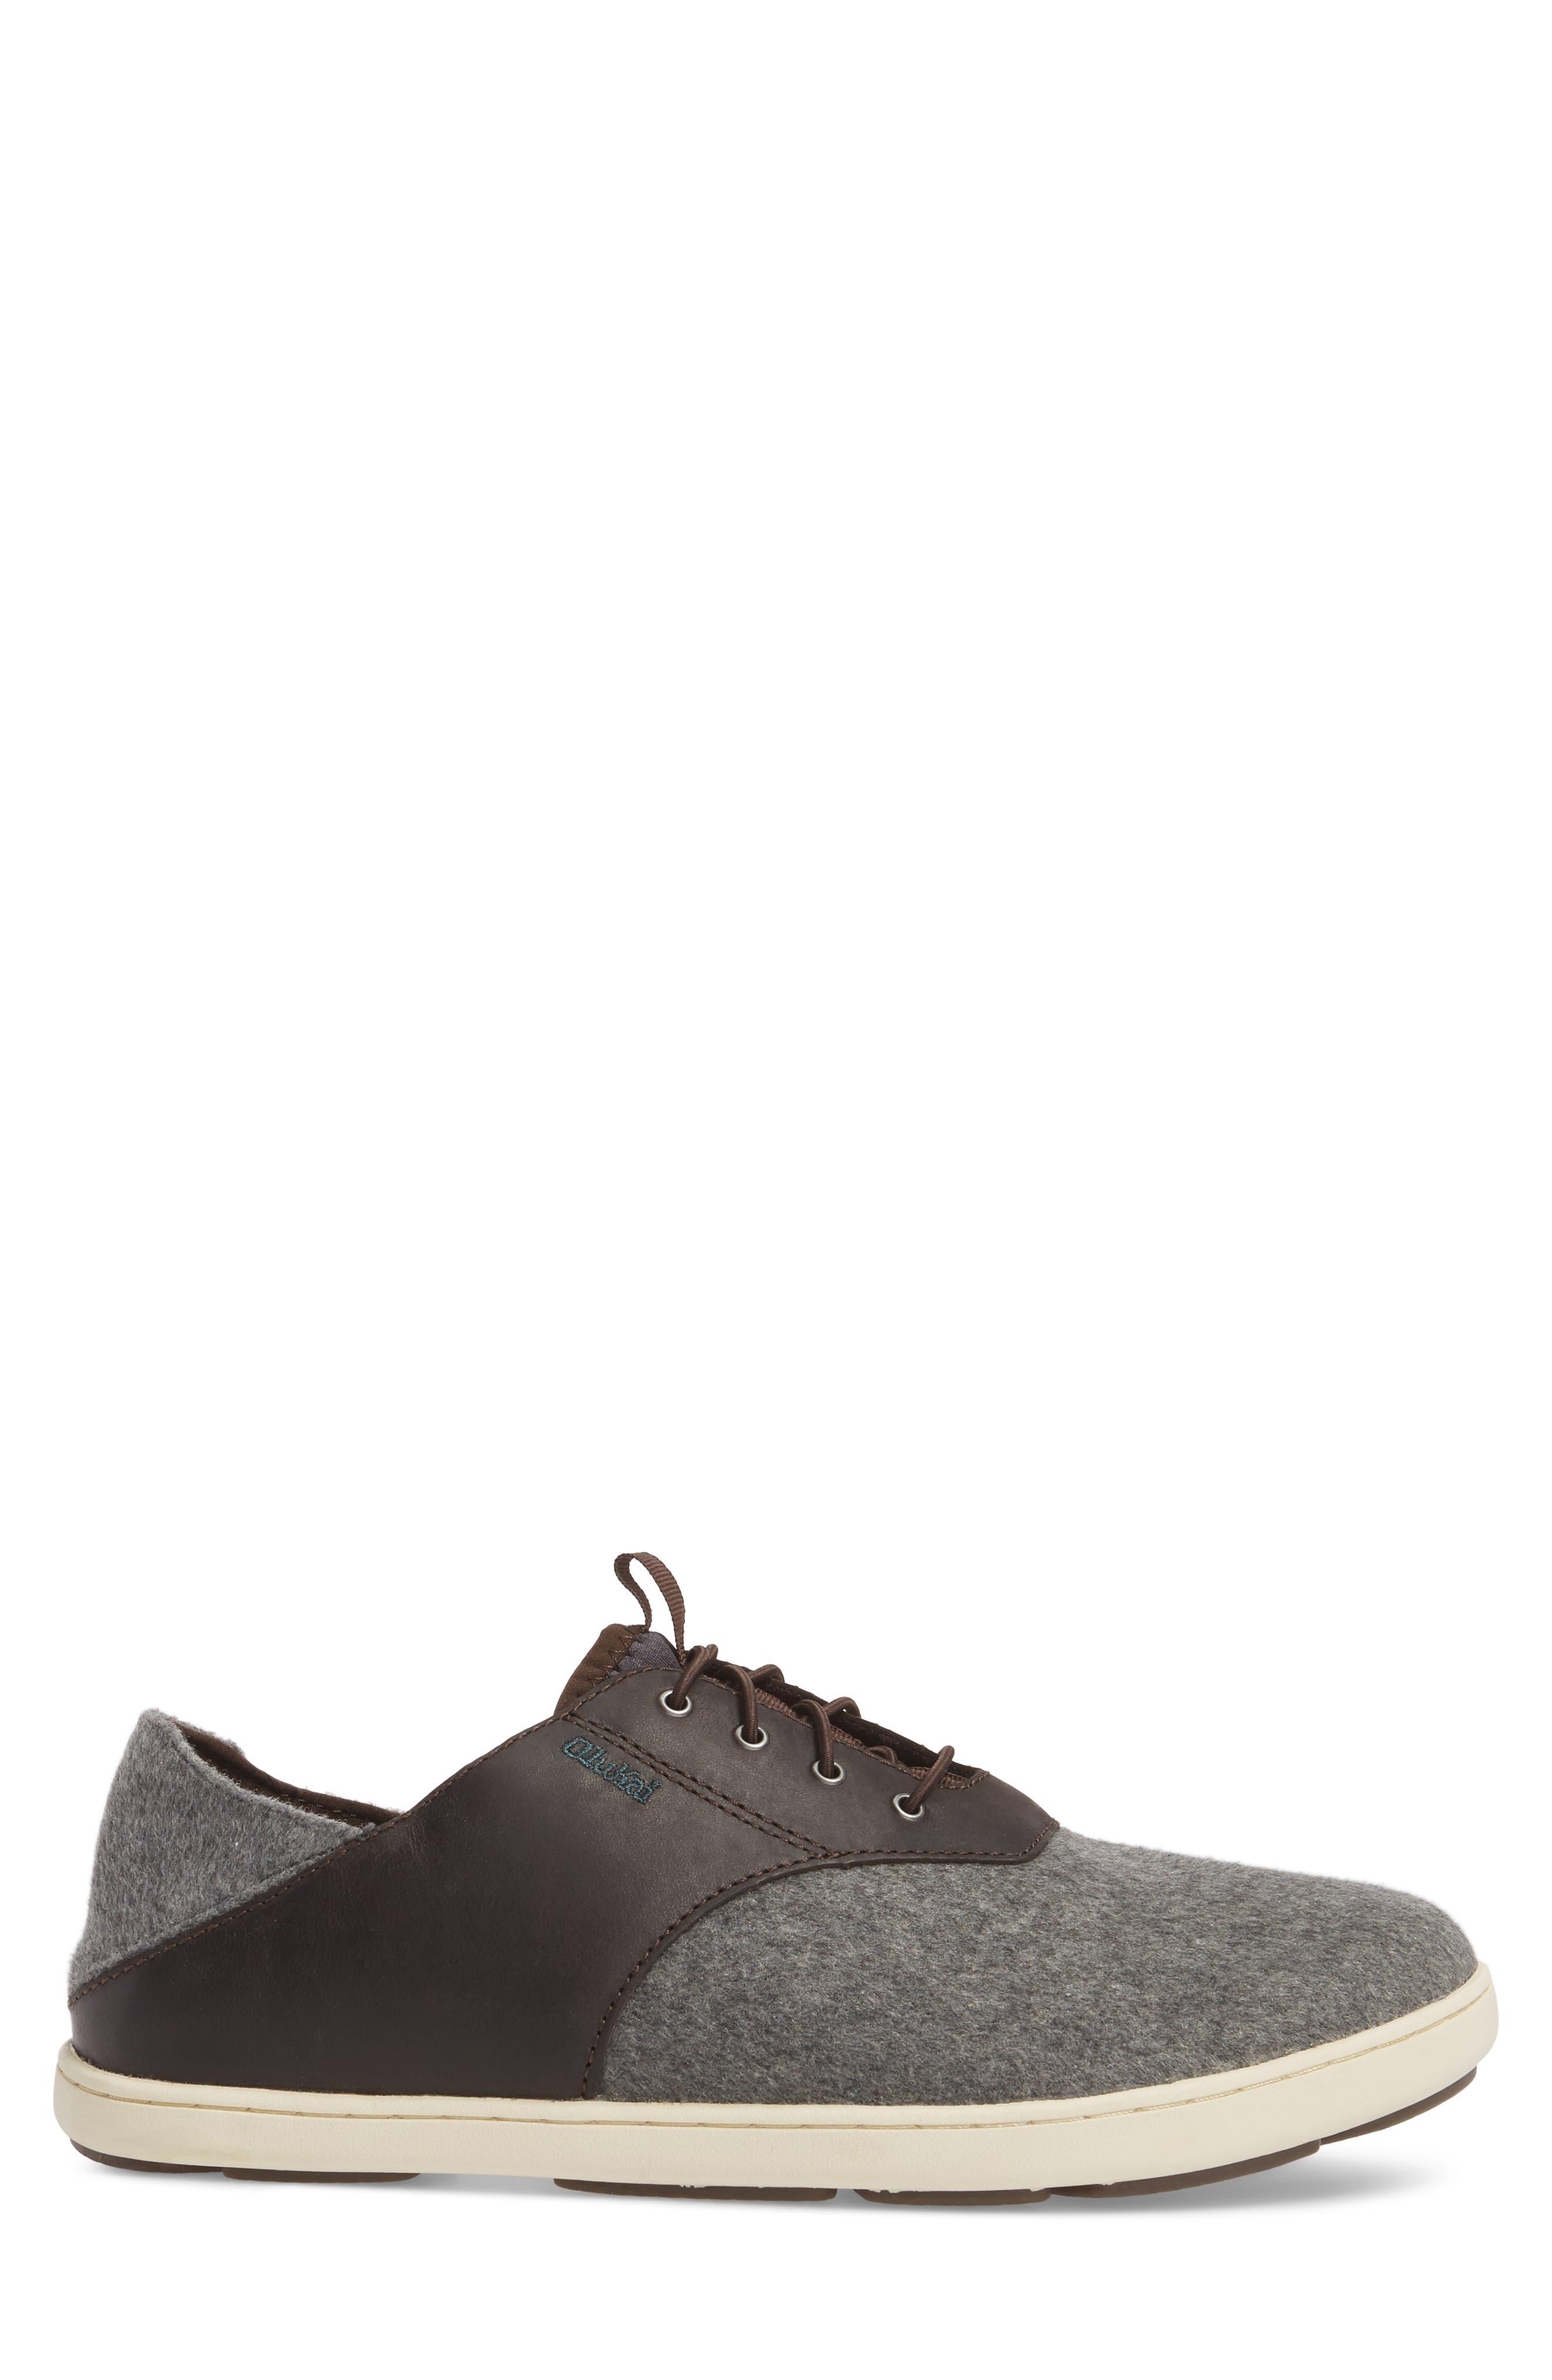 Alternate Image 3  - OluKai Nohea Moku Hulu Sneaker (Men)